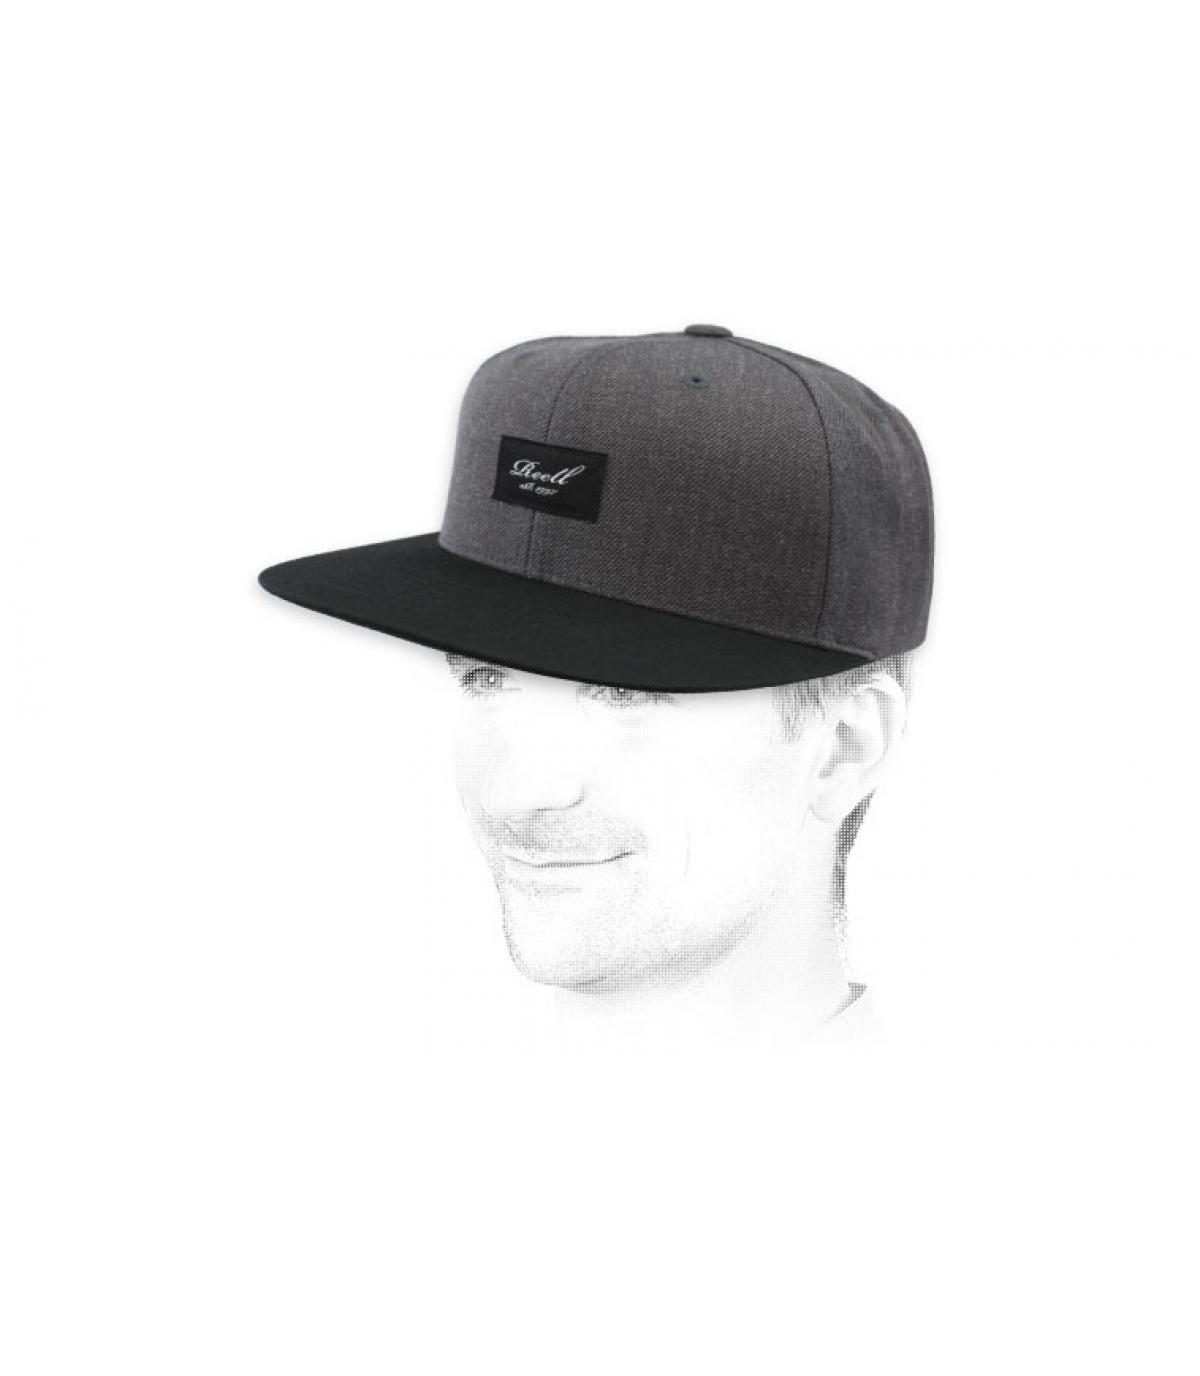 Reell snapback grey